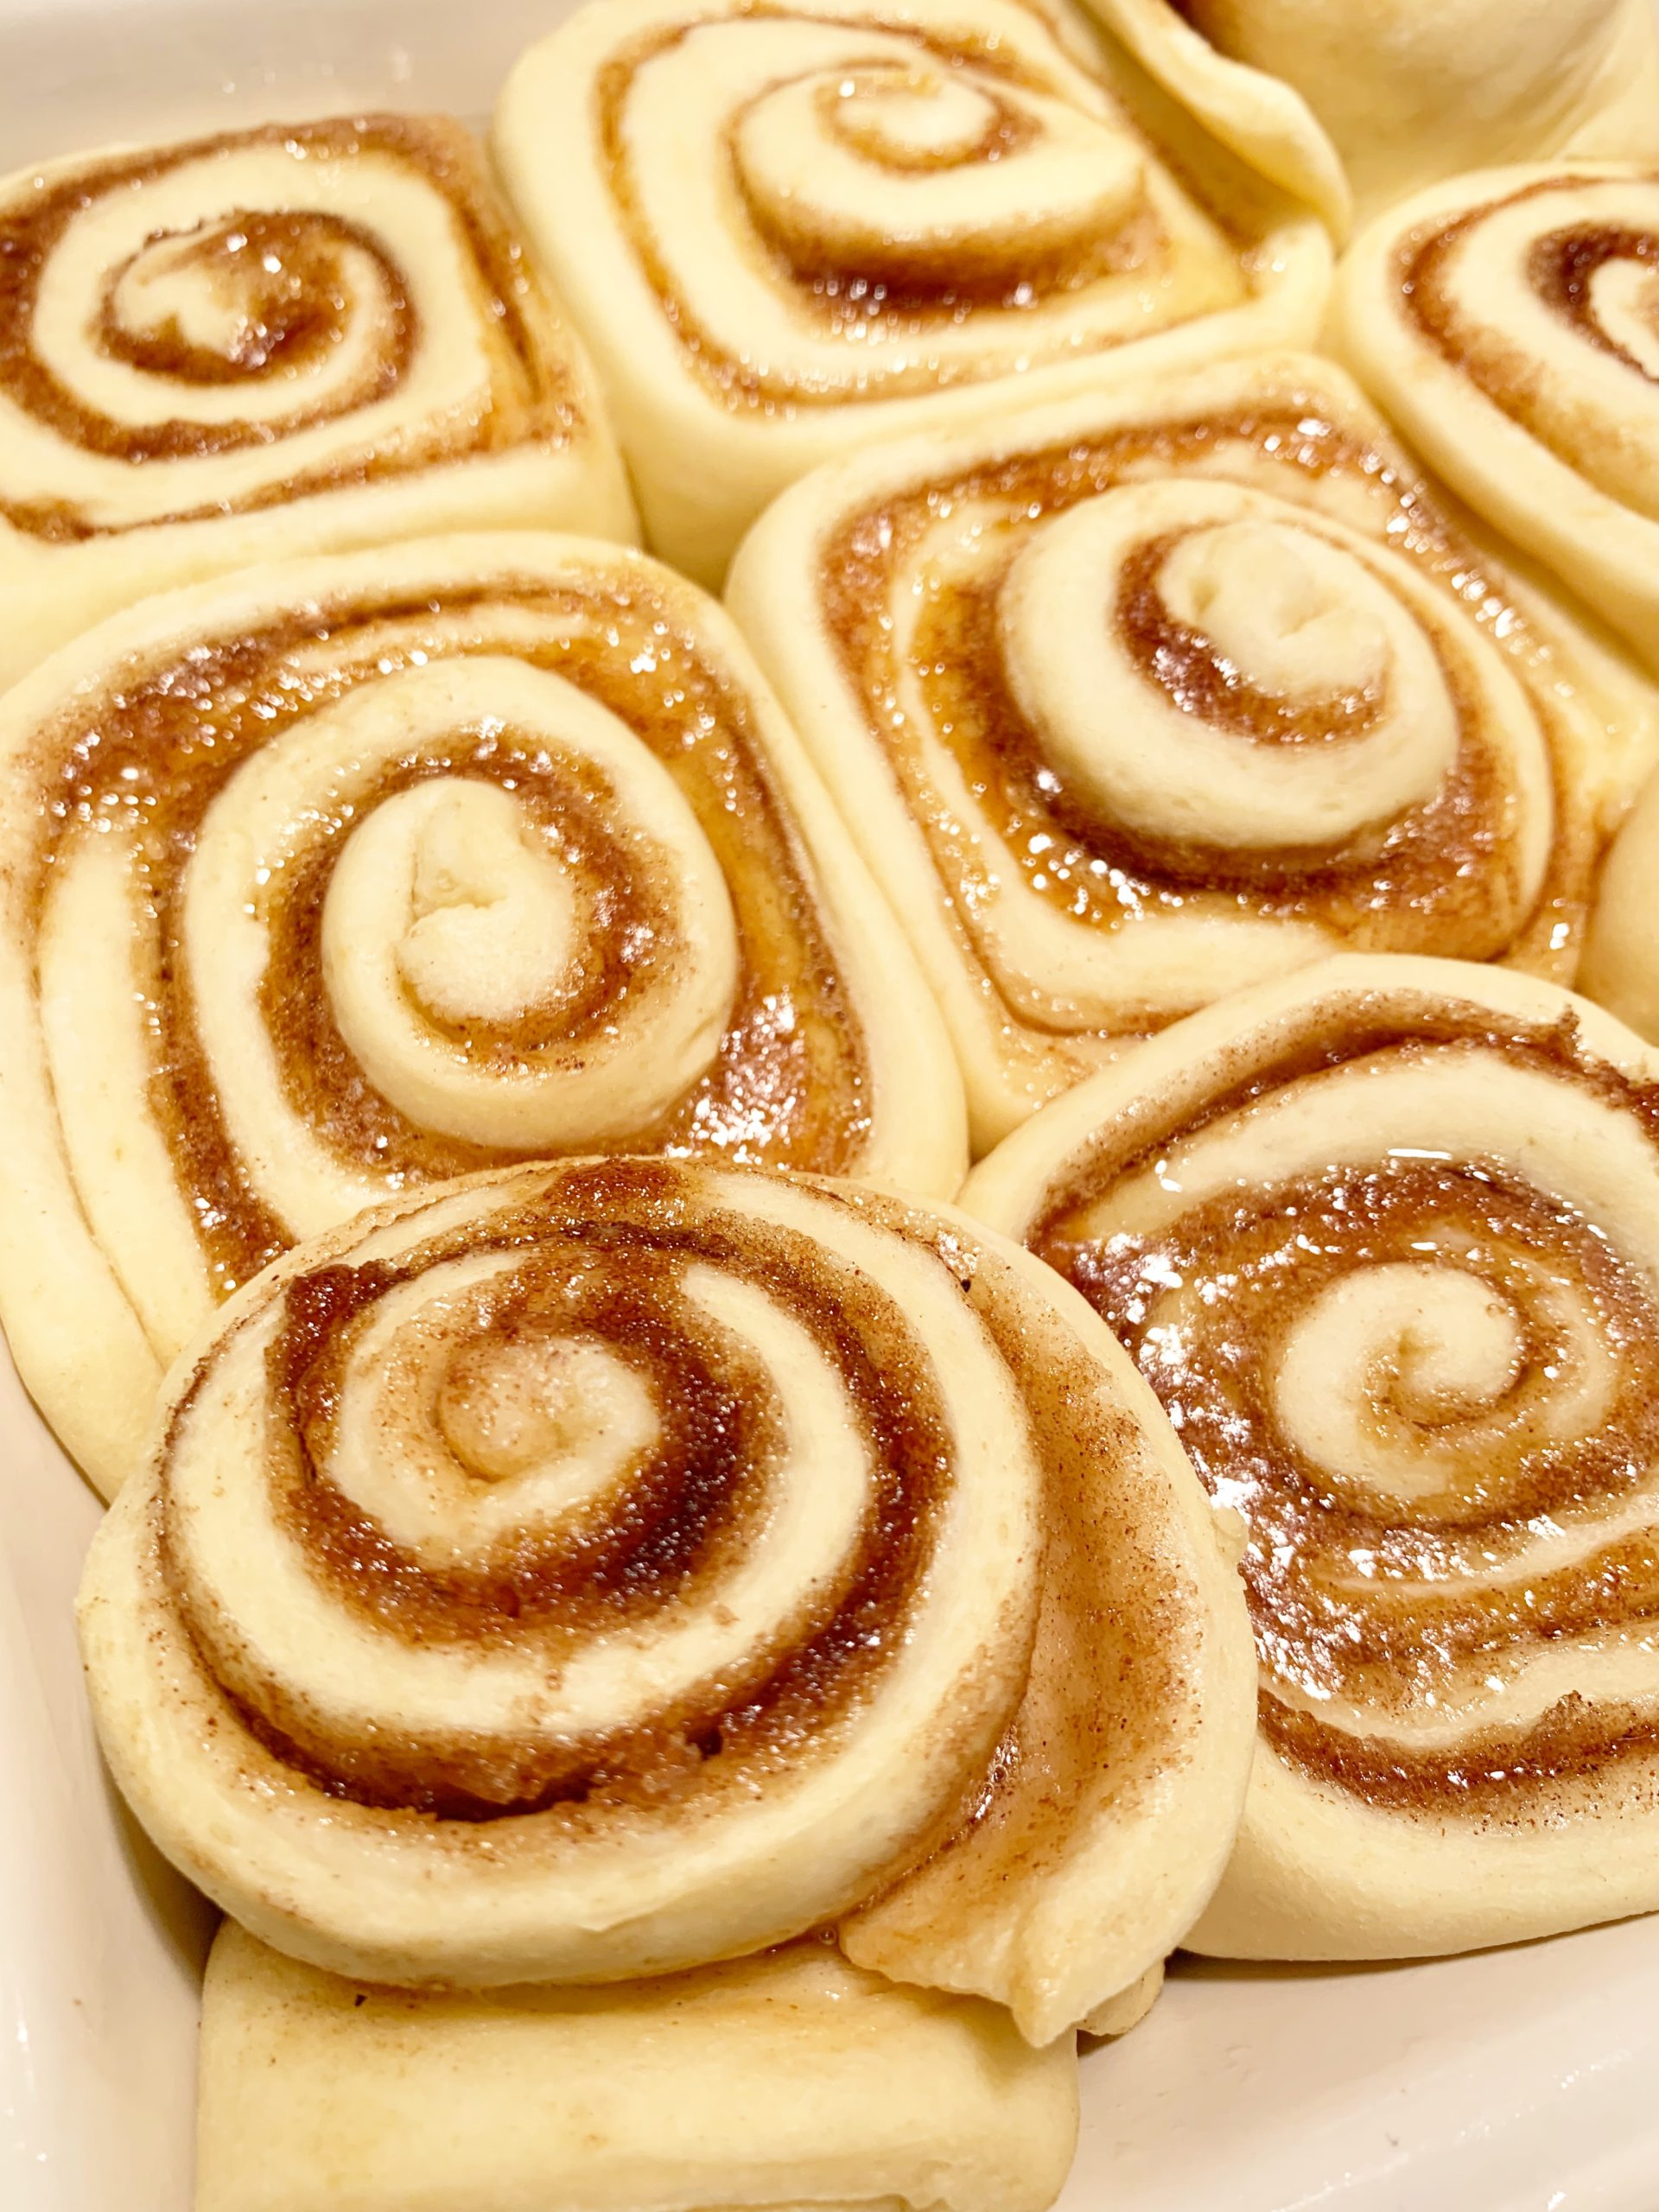 Homemade sourdough cinnamon rolls